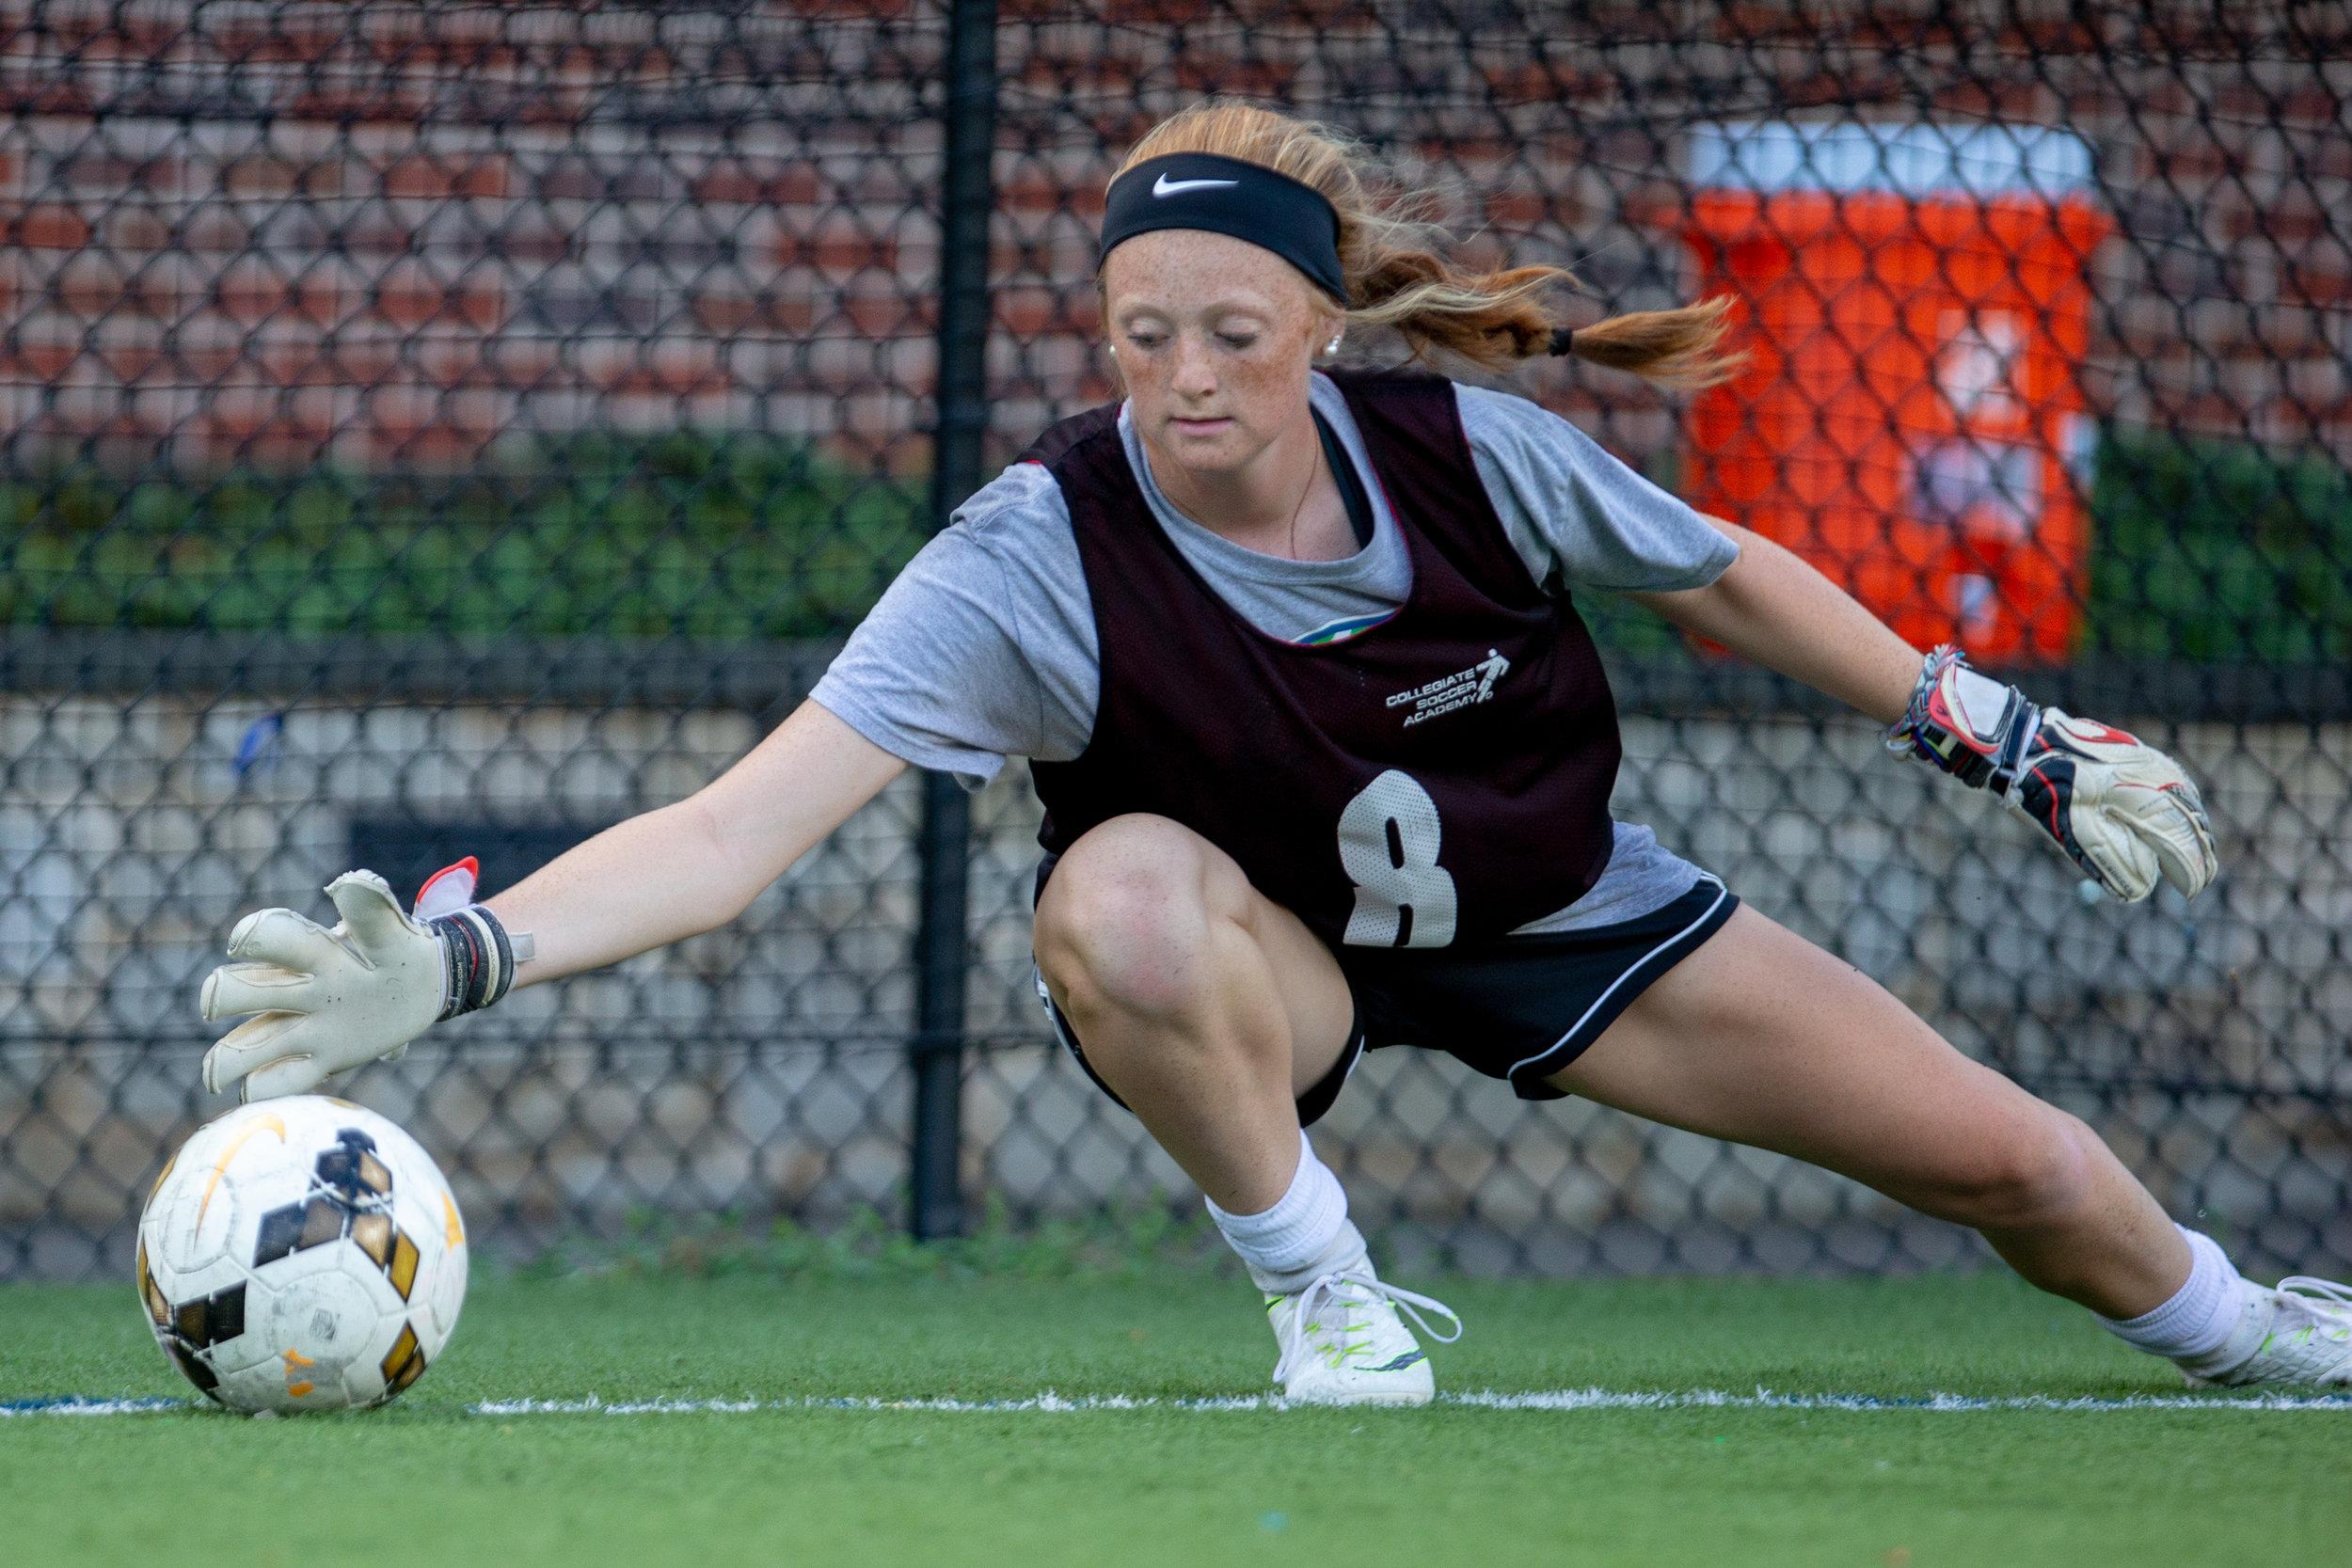 Female saves ball in Newton, Massachusetts